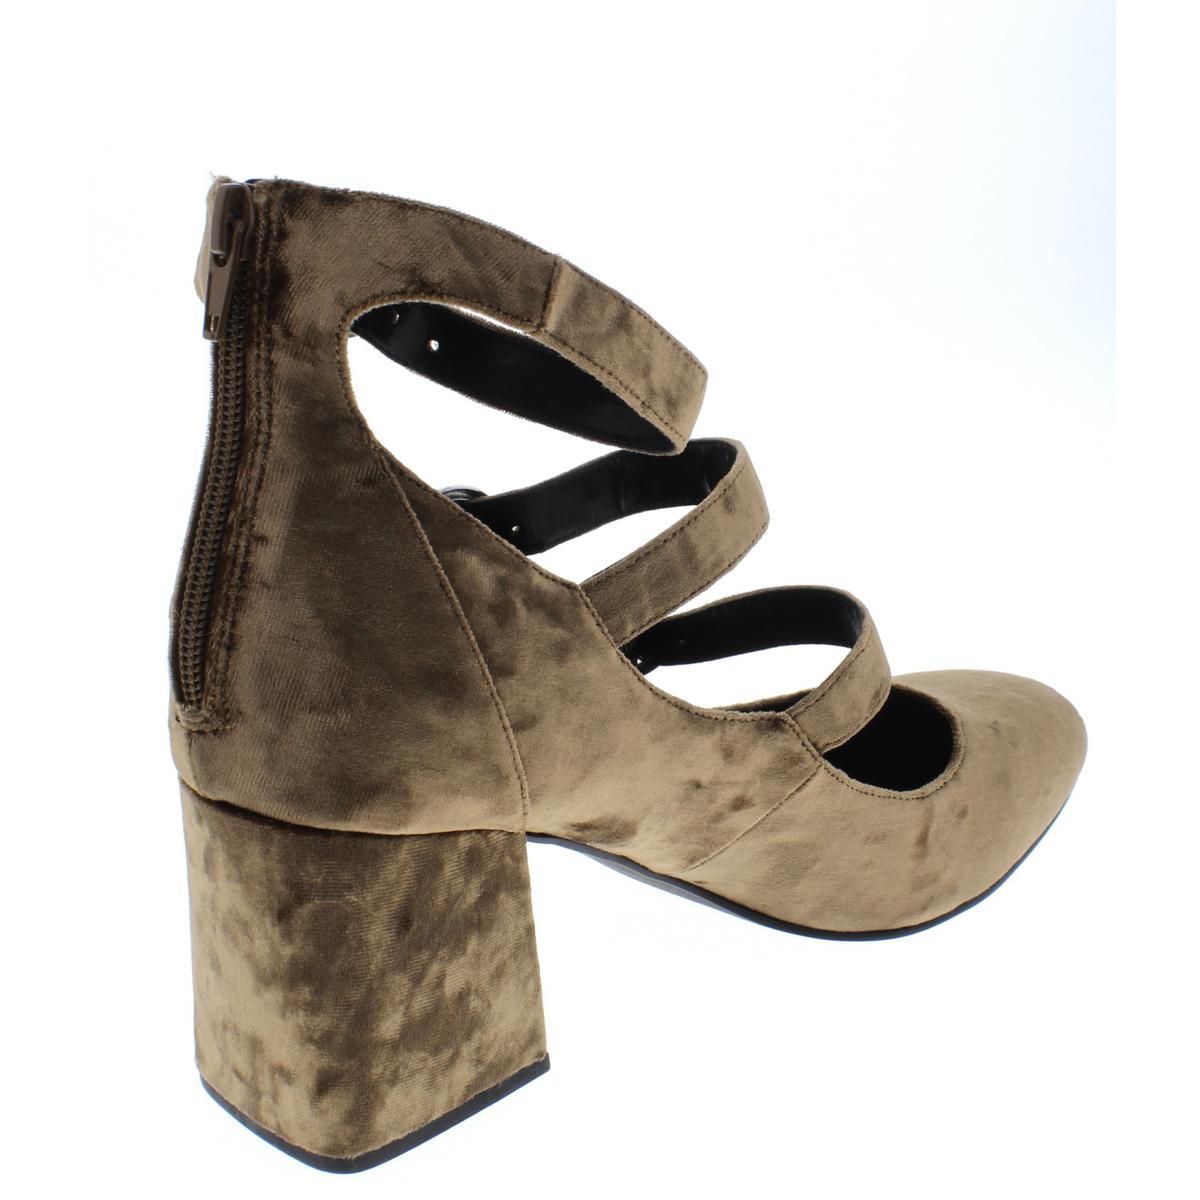 Indigo-Rd-Womens-Jallen-Crushed-Velvet-Dress-Block-Heels-Shoes-BHFO-6024 thumbnail 4